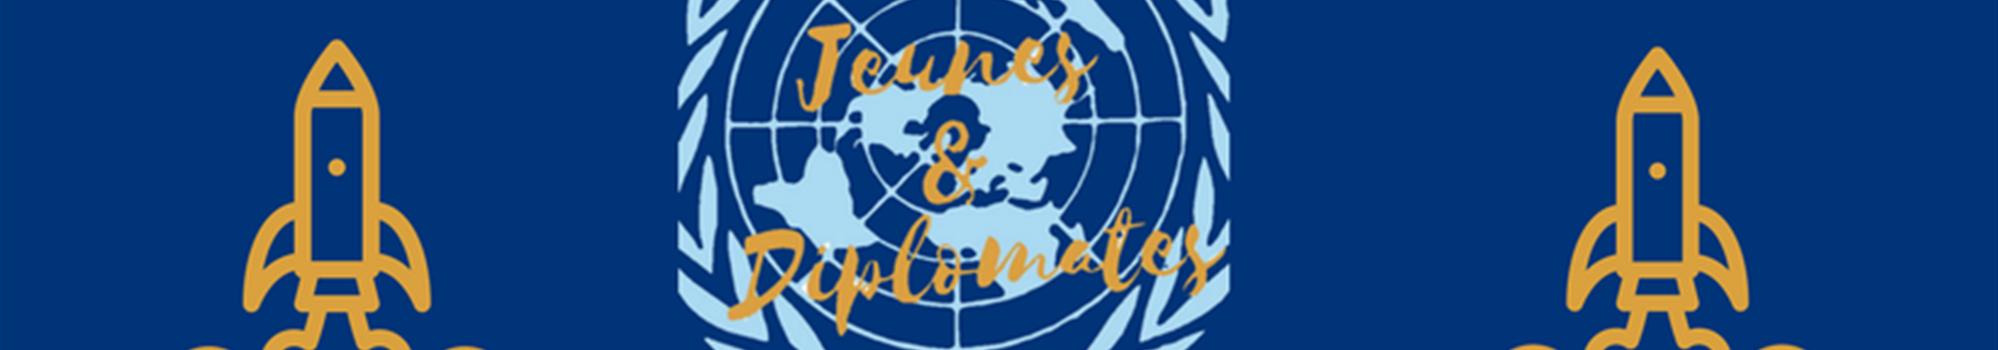 Jeunes & Diplomates  - Archim'aide